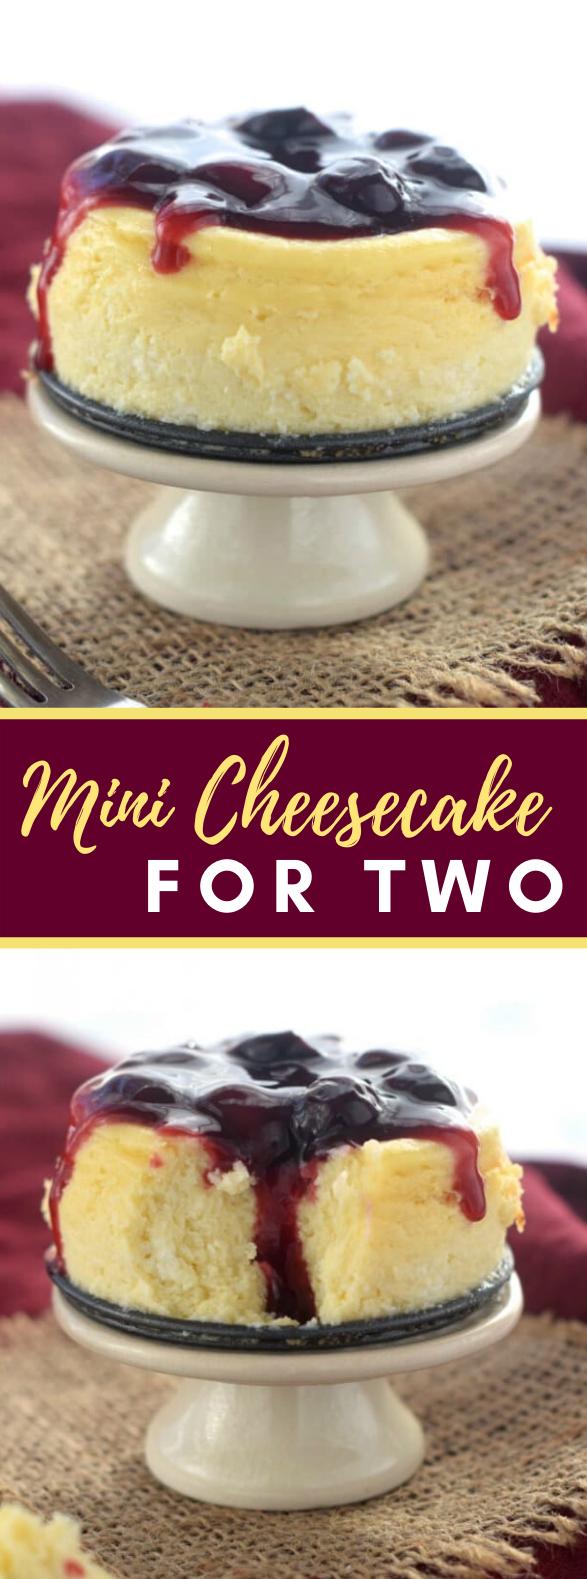 MINI CHEESECAKE FOR TWO #desserts #valentineday